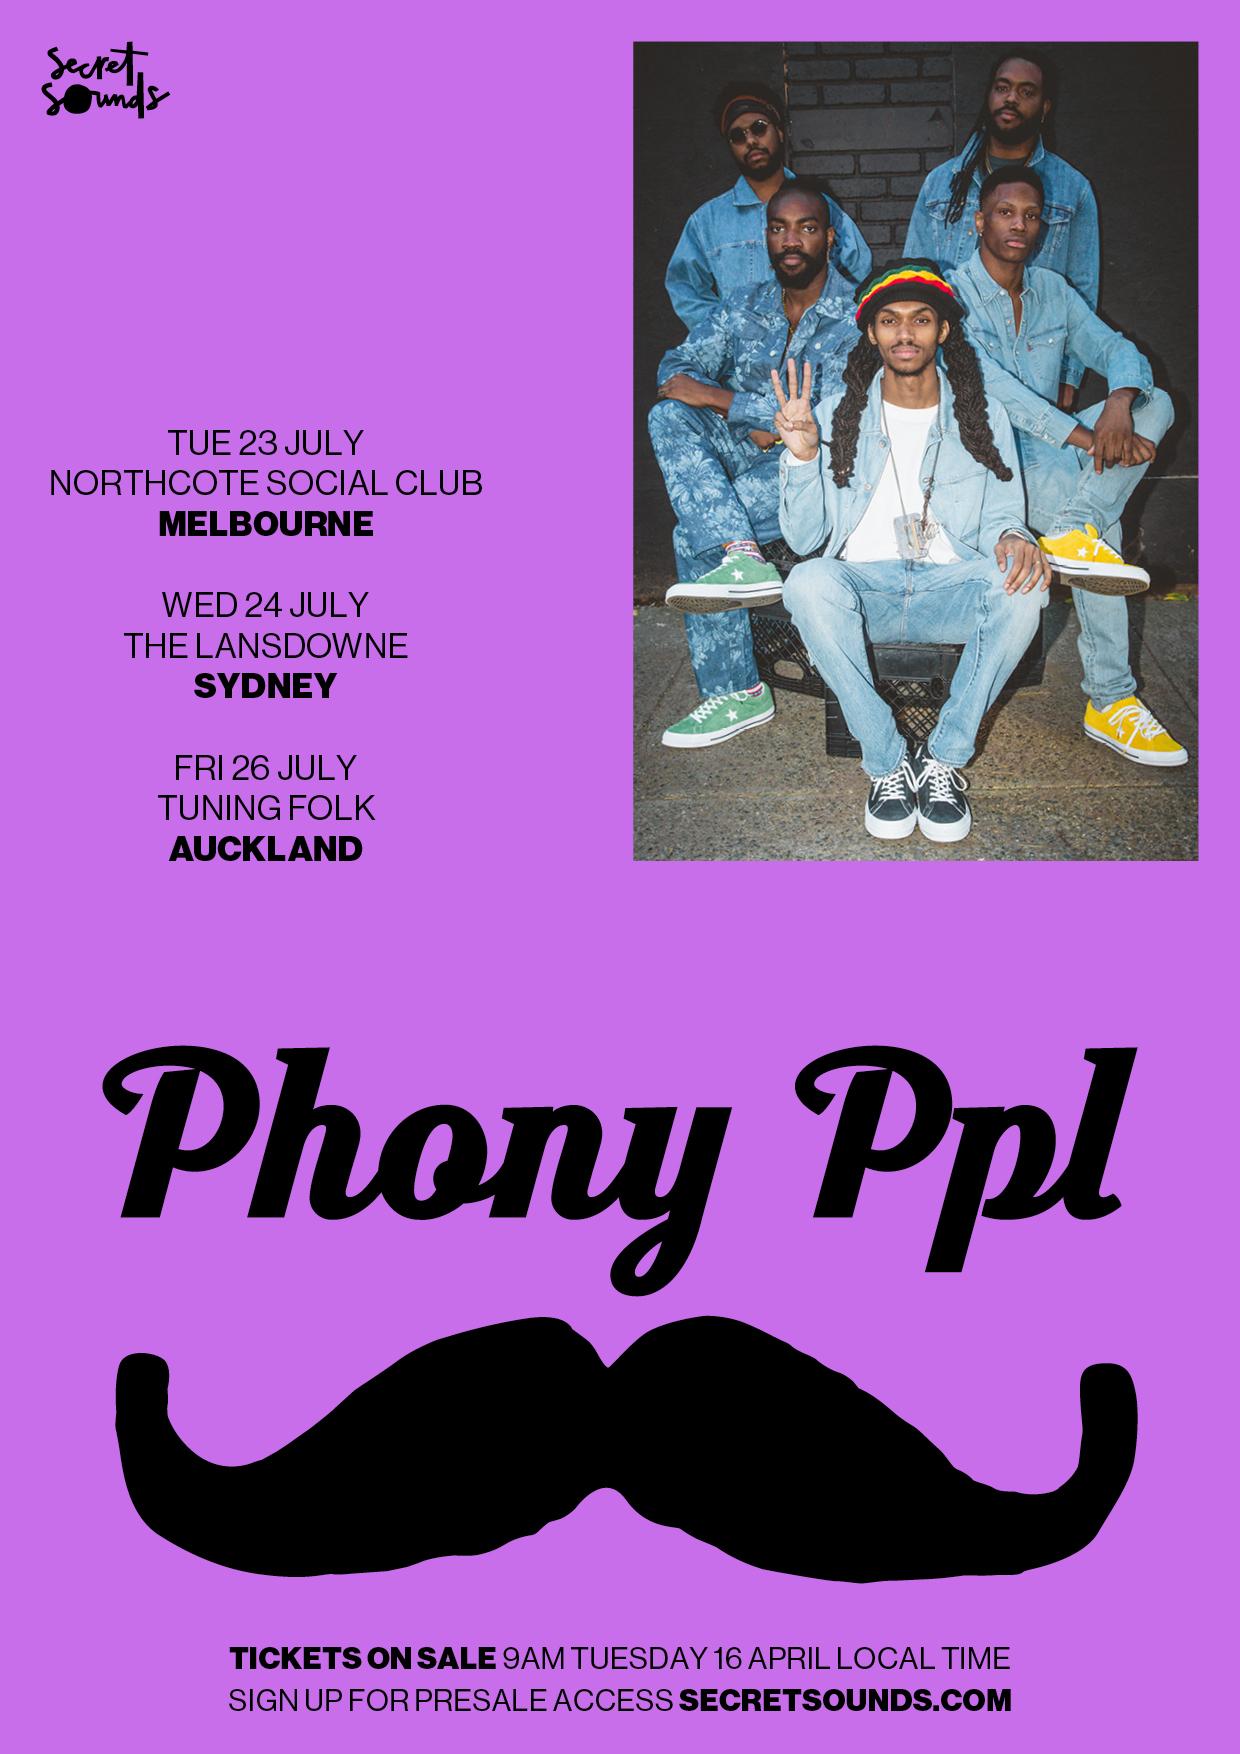 Phony ppl.jpg